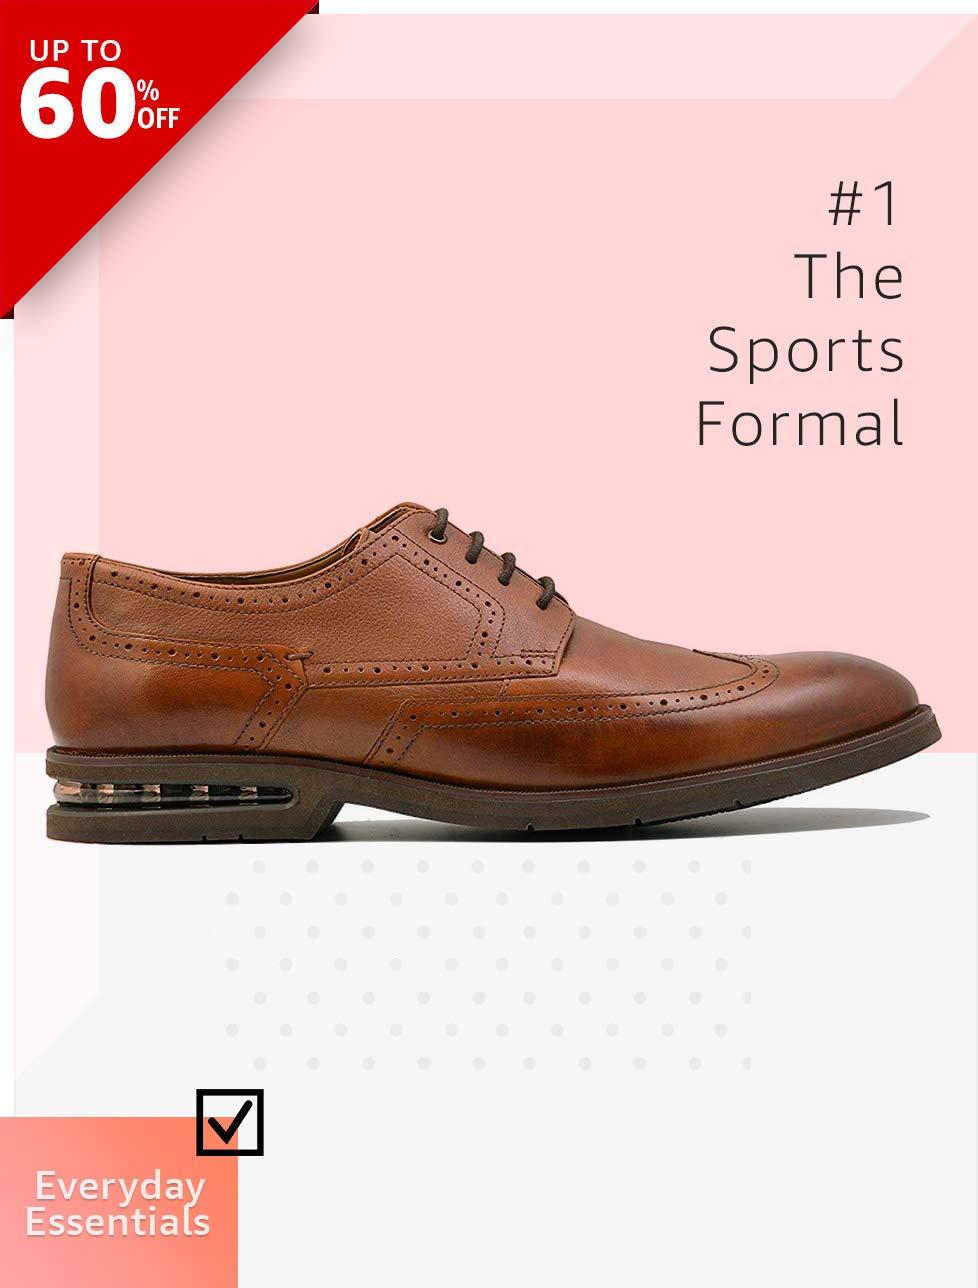 c51c57ab9 Up to 70% off on Men s Shoes online at best prices on amazon.in